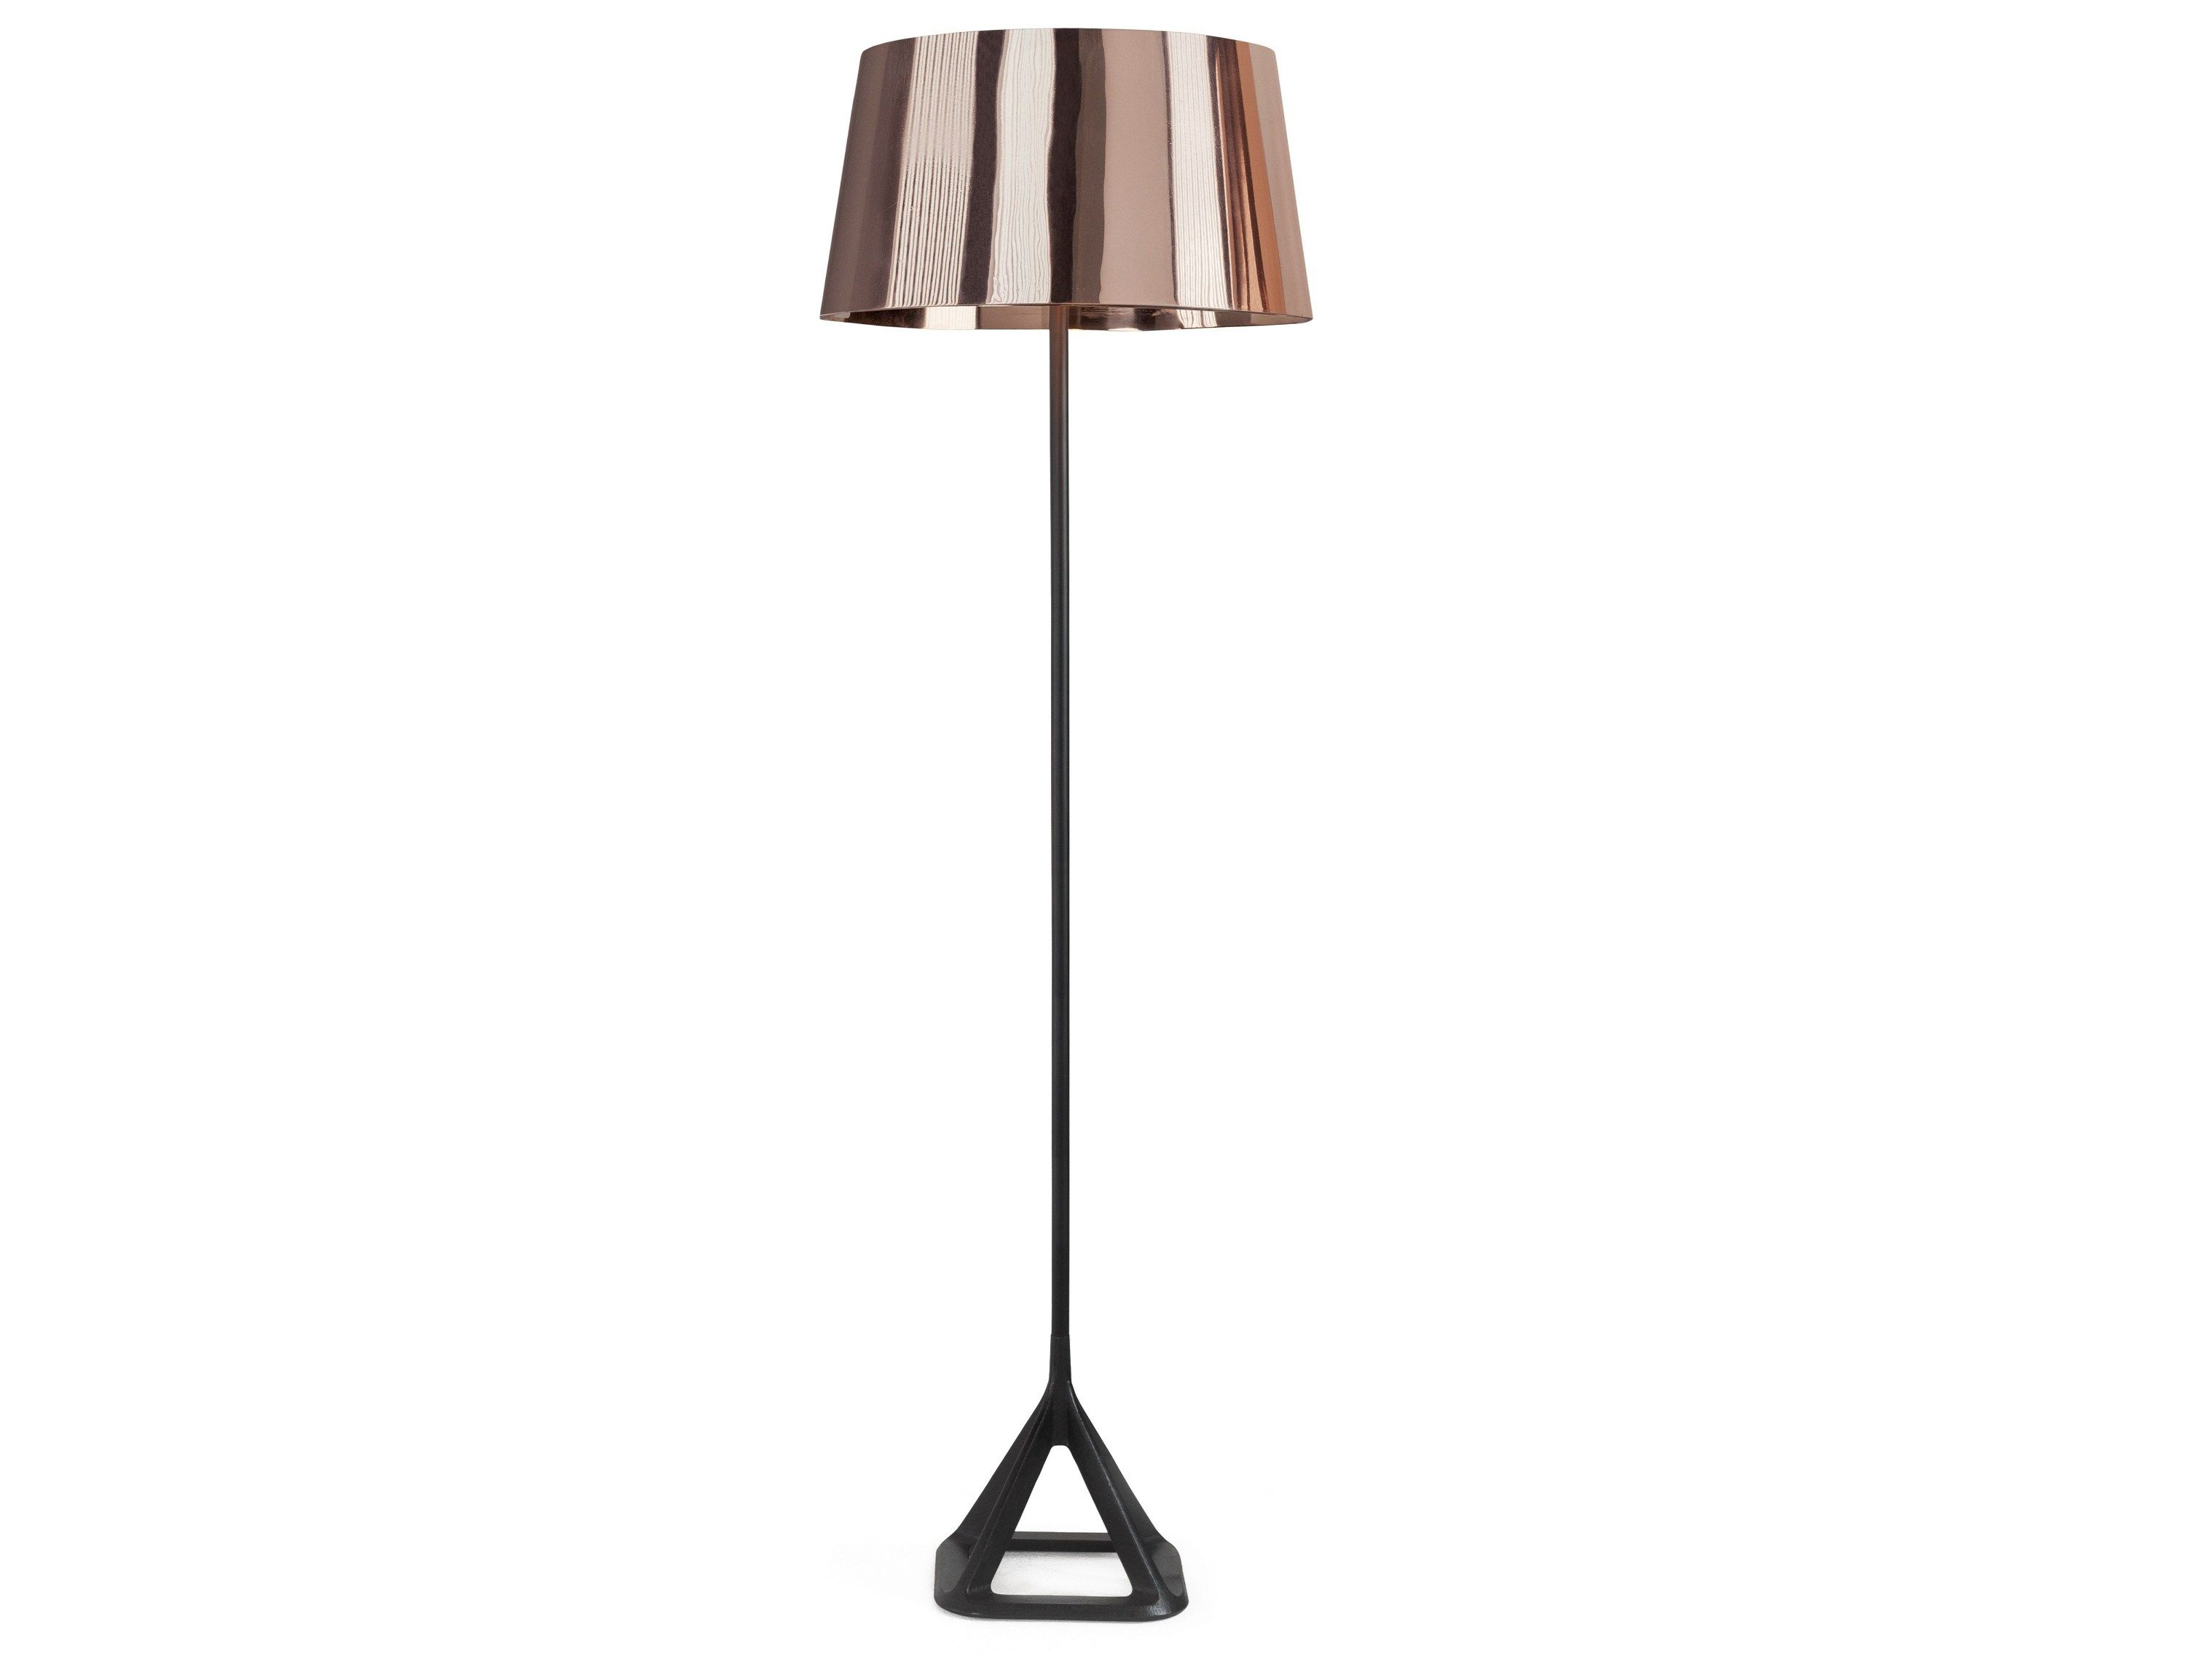 Copper Floor Lamp Base Copper Floor Light By Tom Dixon Design Tom Dixon Copper Floor Light Copper Floor Lamp Floor Lights